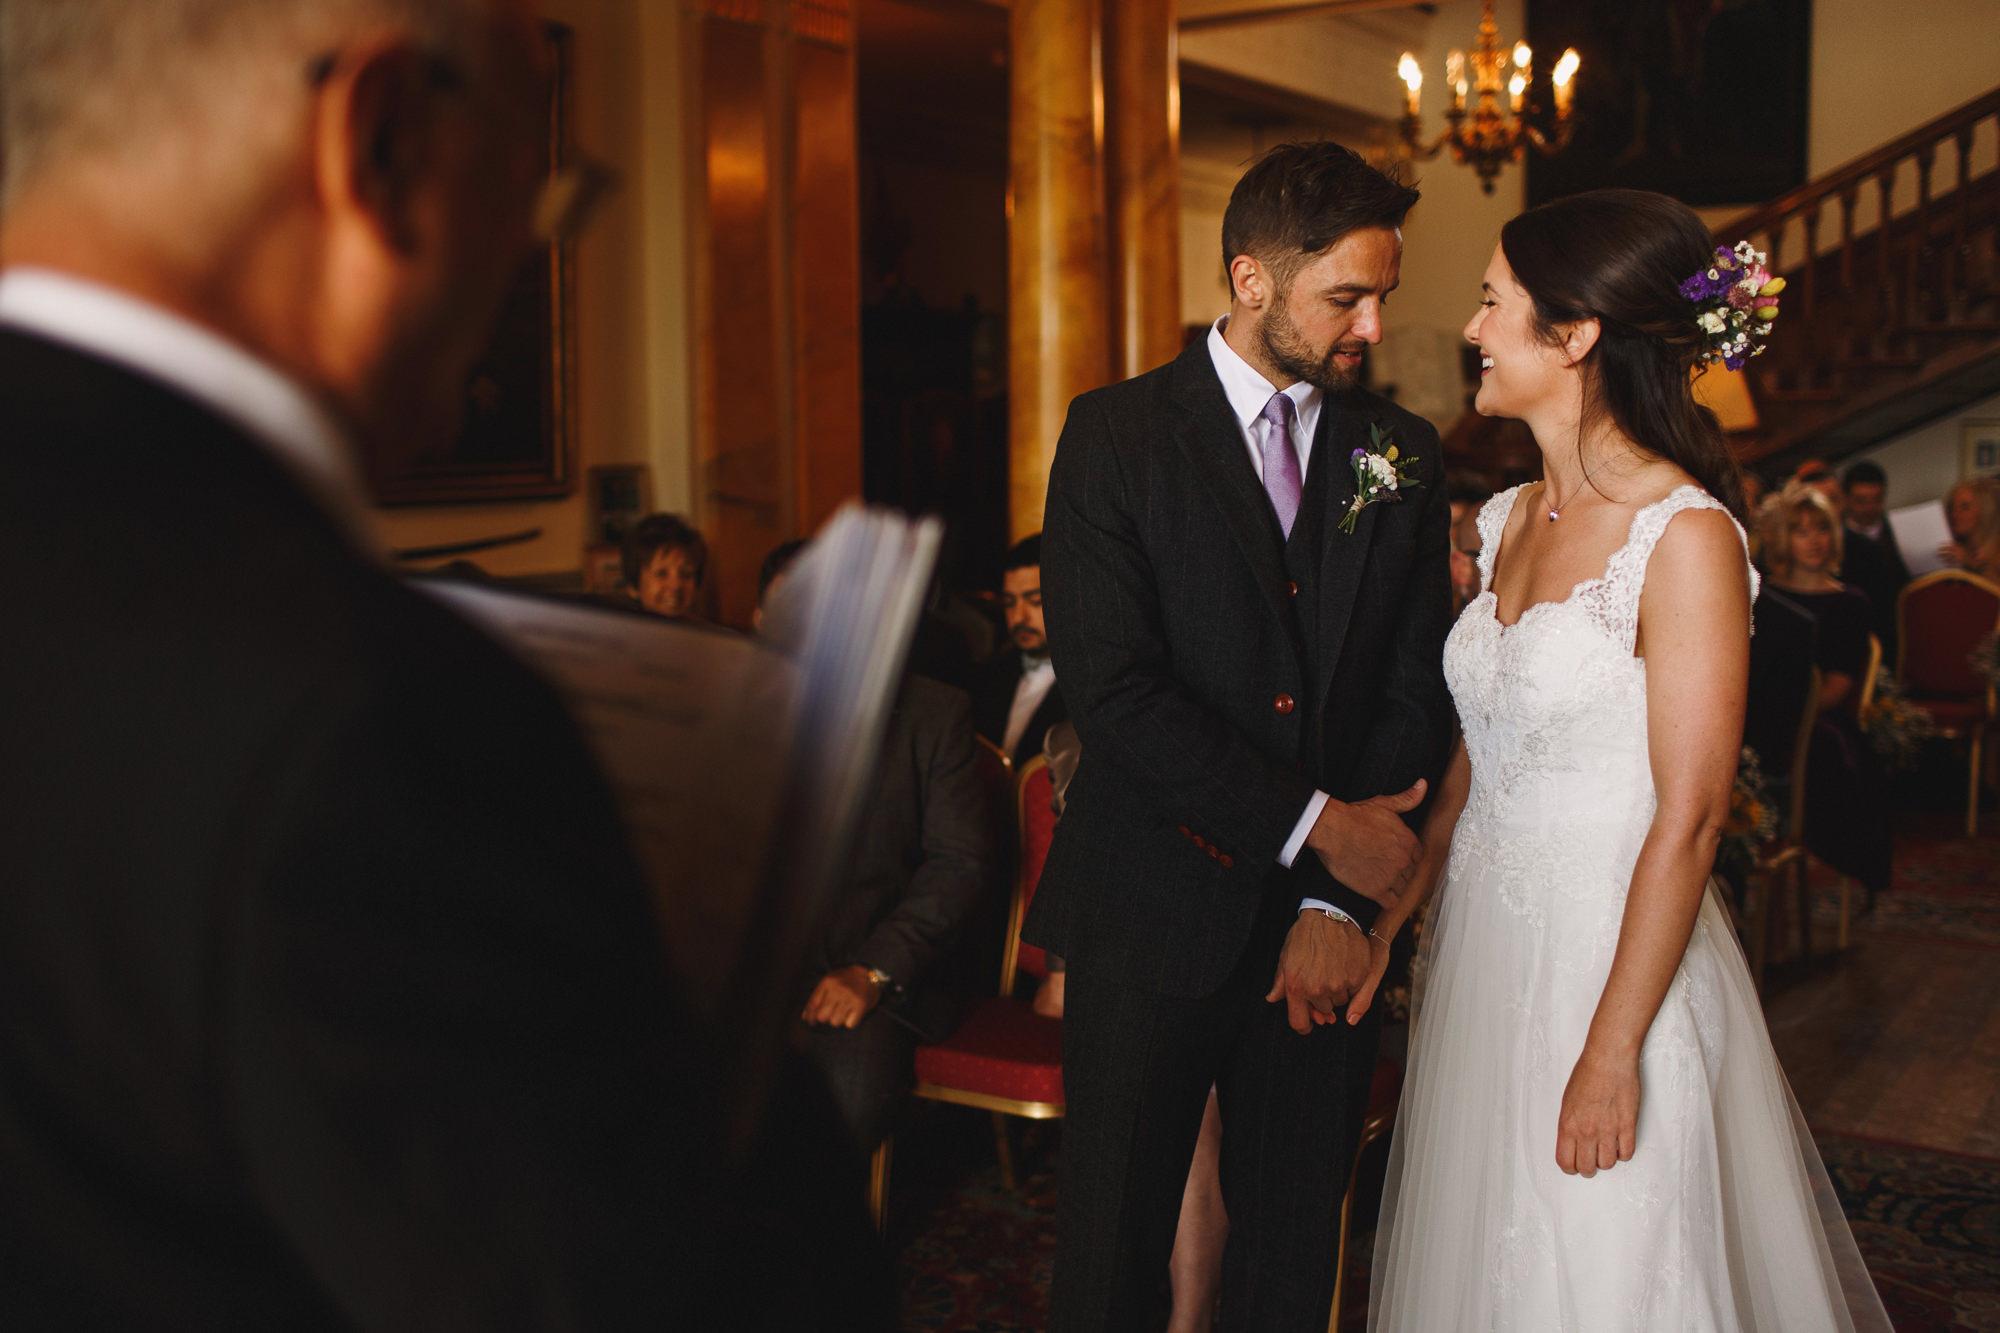 Walcot hall wedding photography shropshire 11